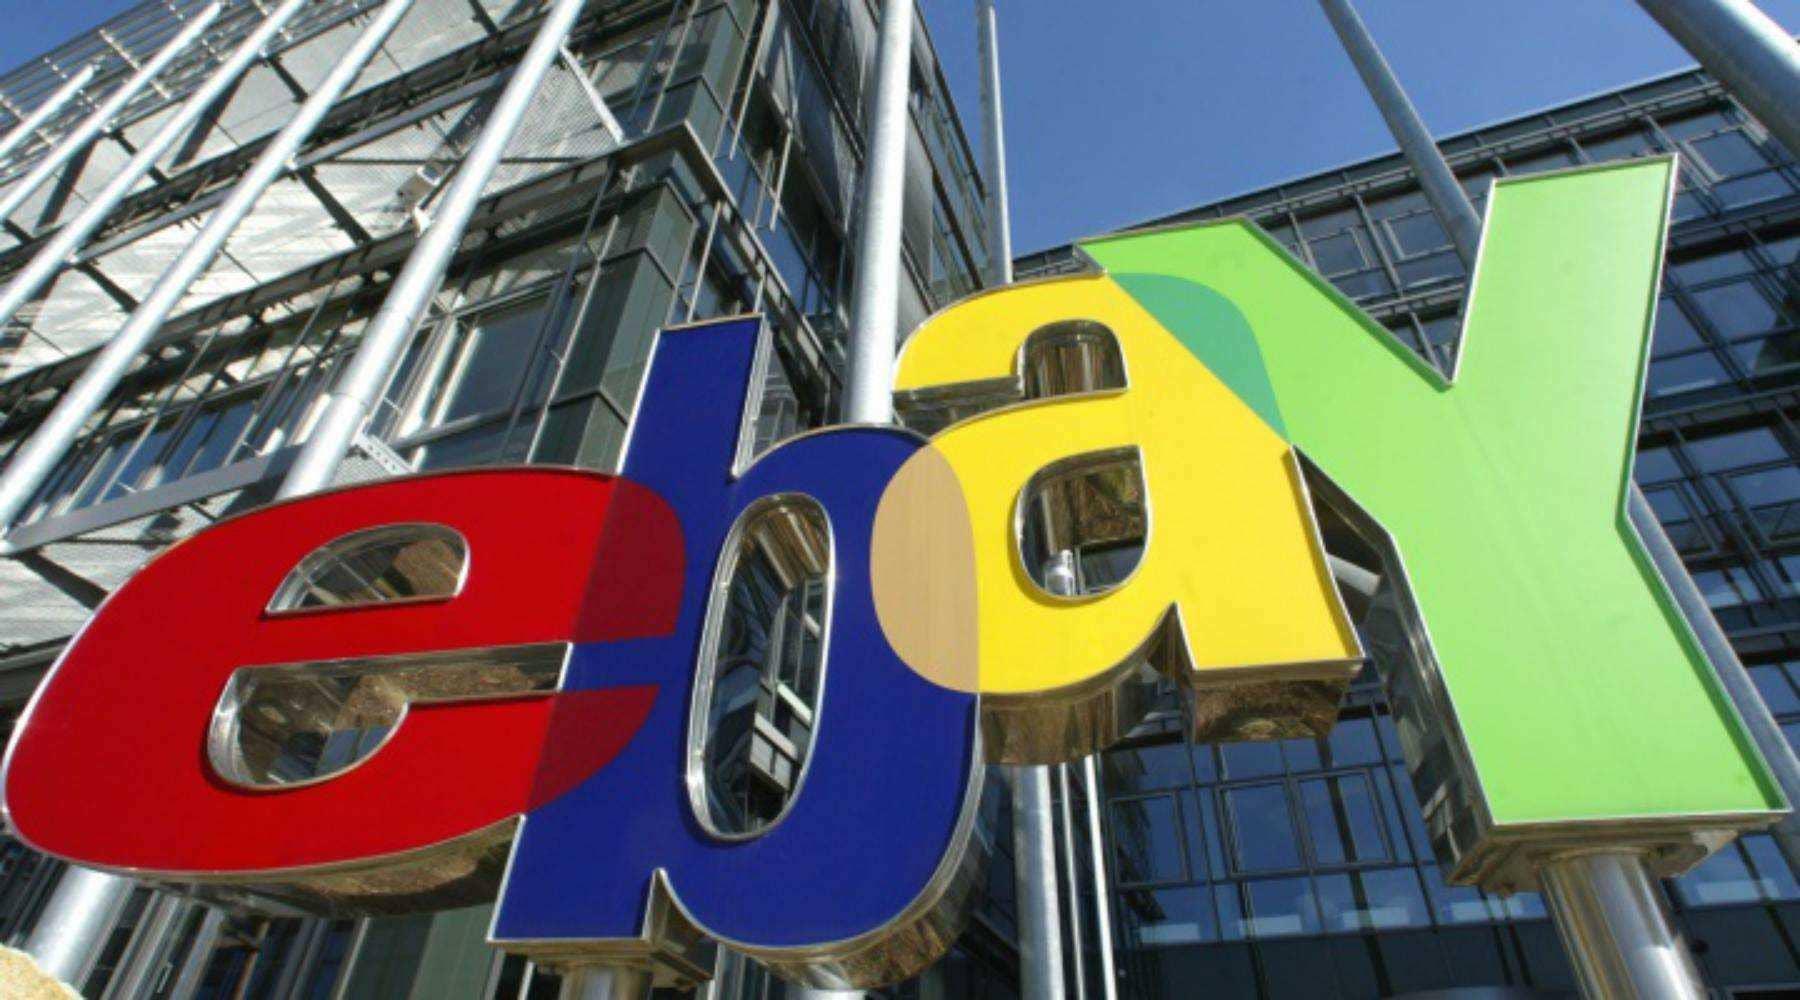 О торговых платформах Amazon и Ebay